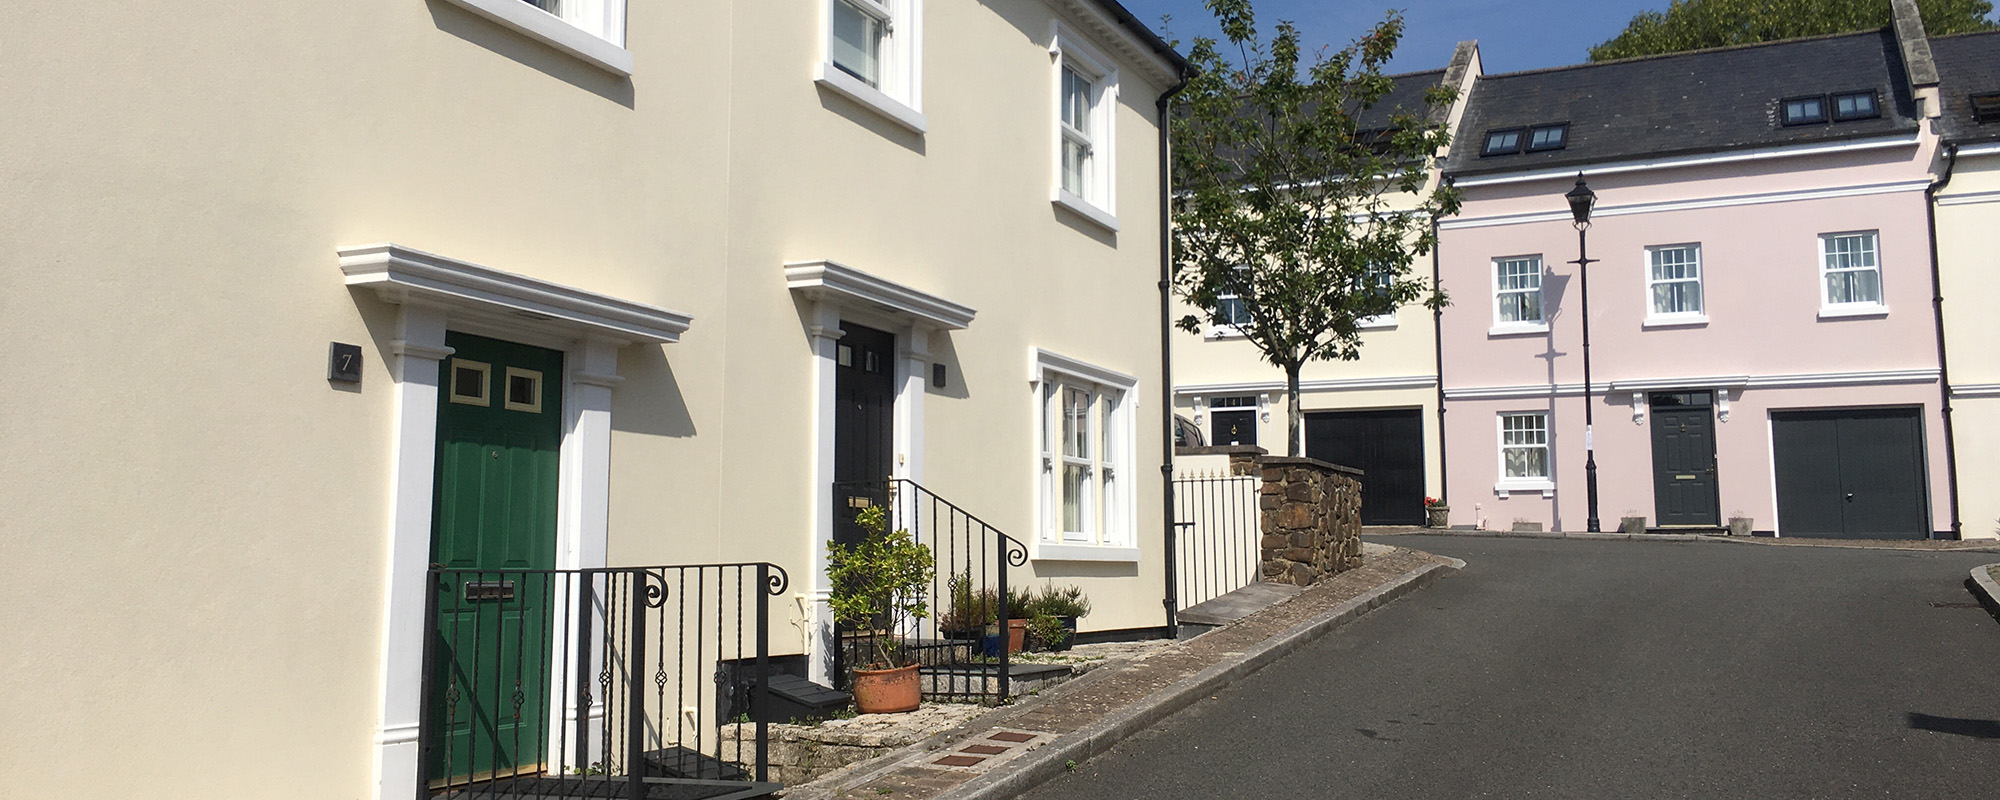 GrahamClark-PlanningConsultant-Devon-Cornwall